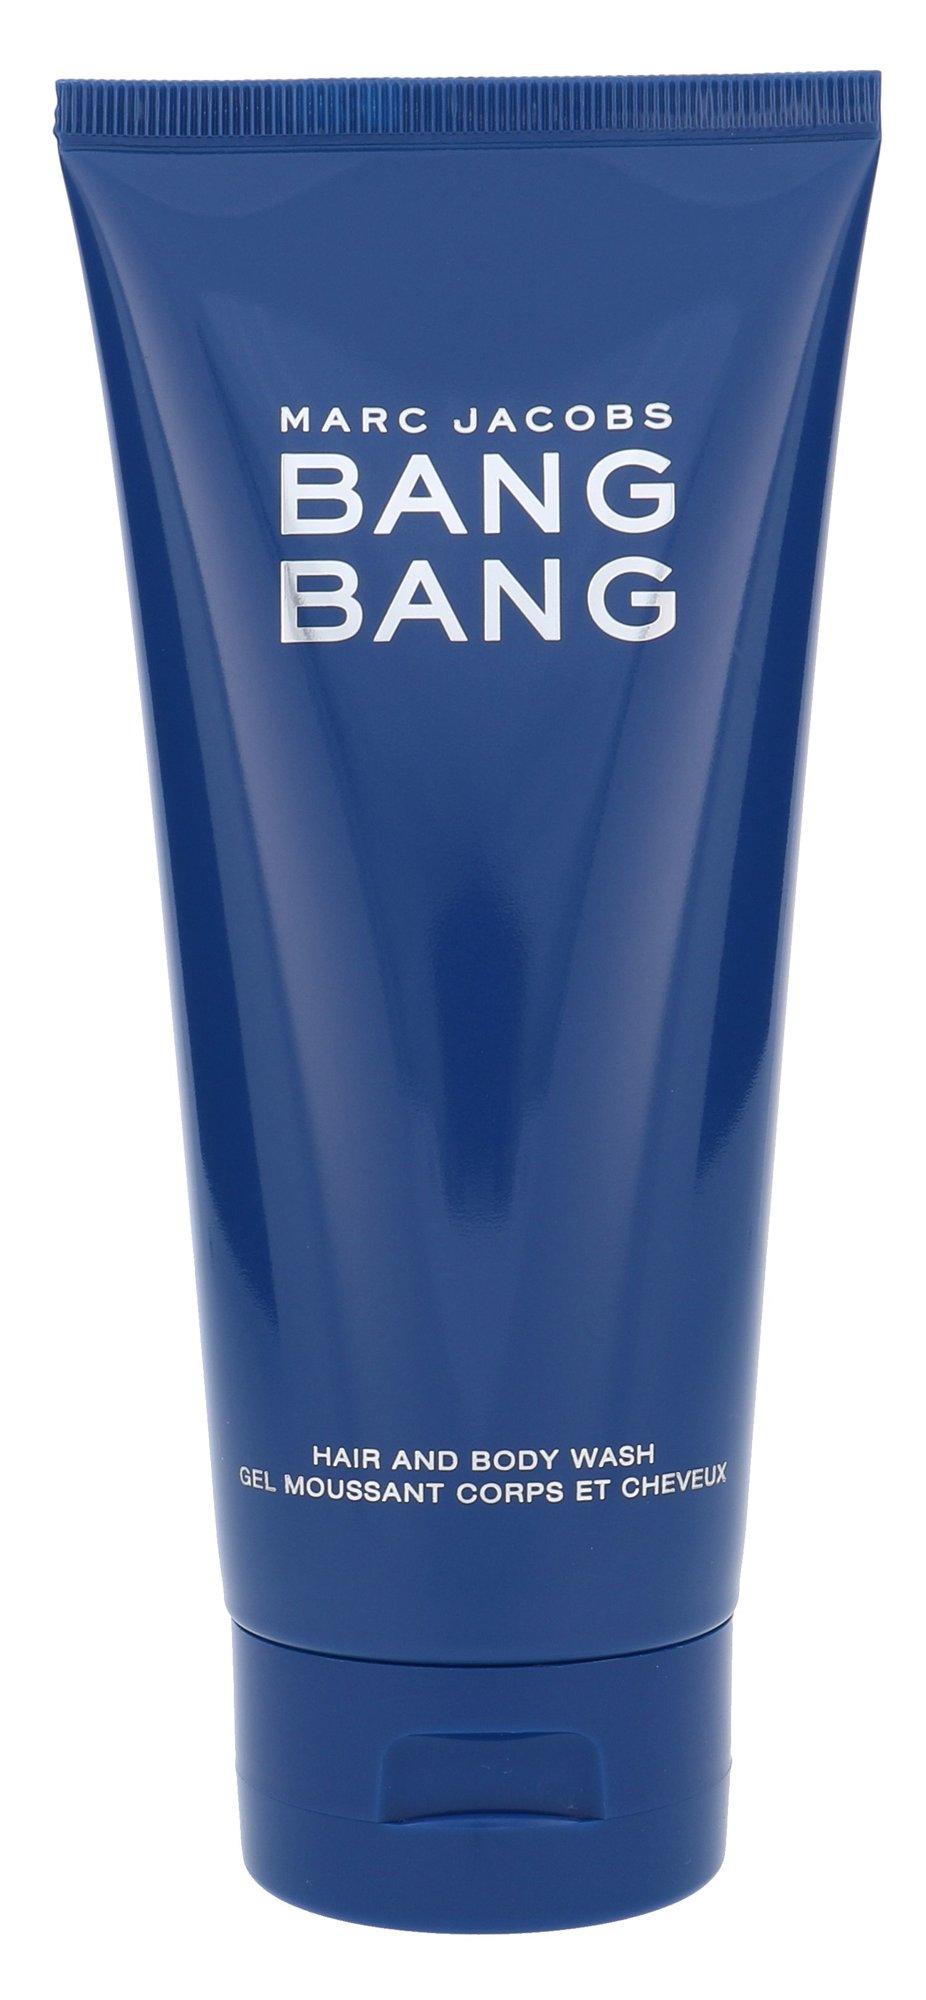 Marc Jacobs Bang Bang Shower gel 200ml